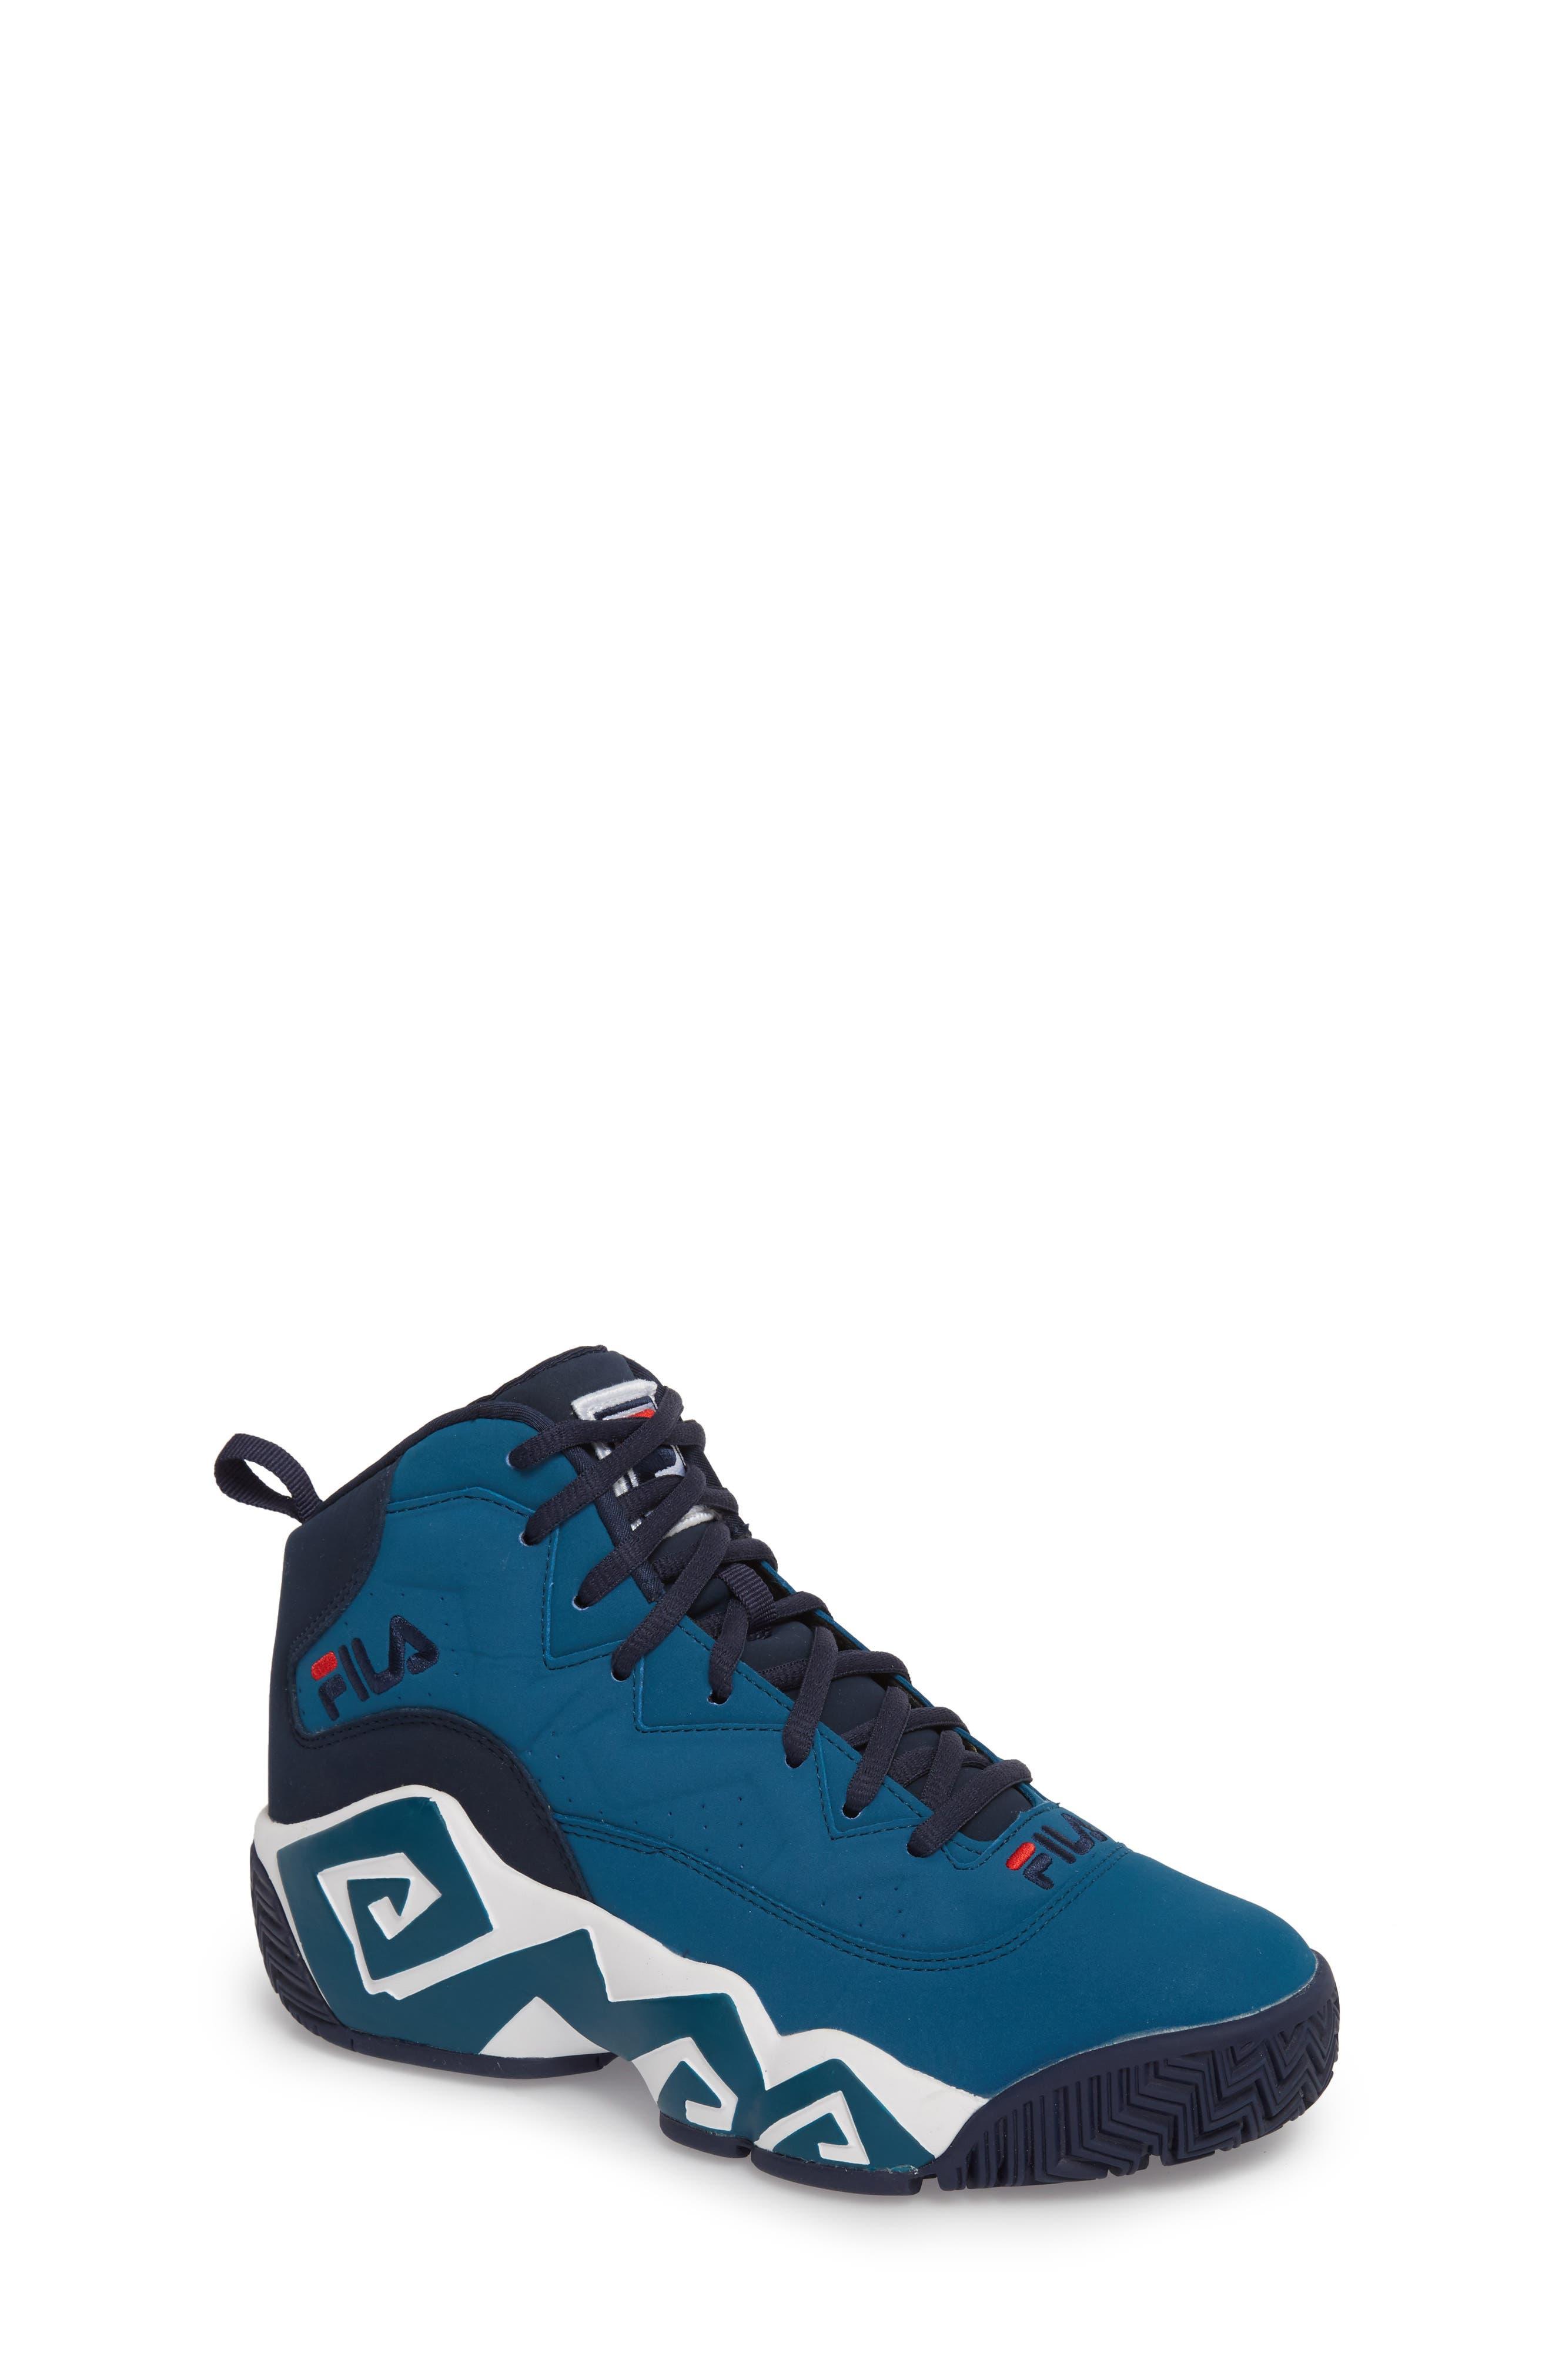 MB High Top Sneaker,                         Main,                         color, INK BLUE/ FILA NAVY